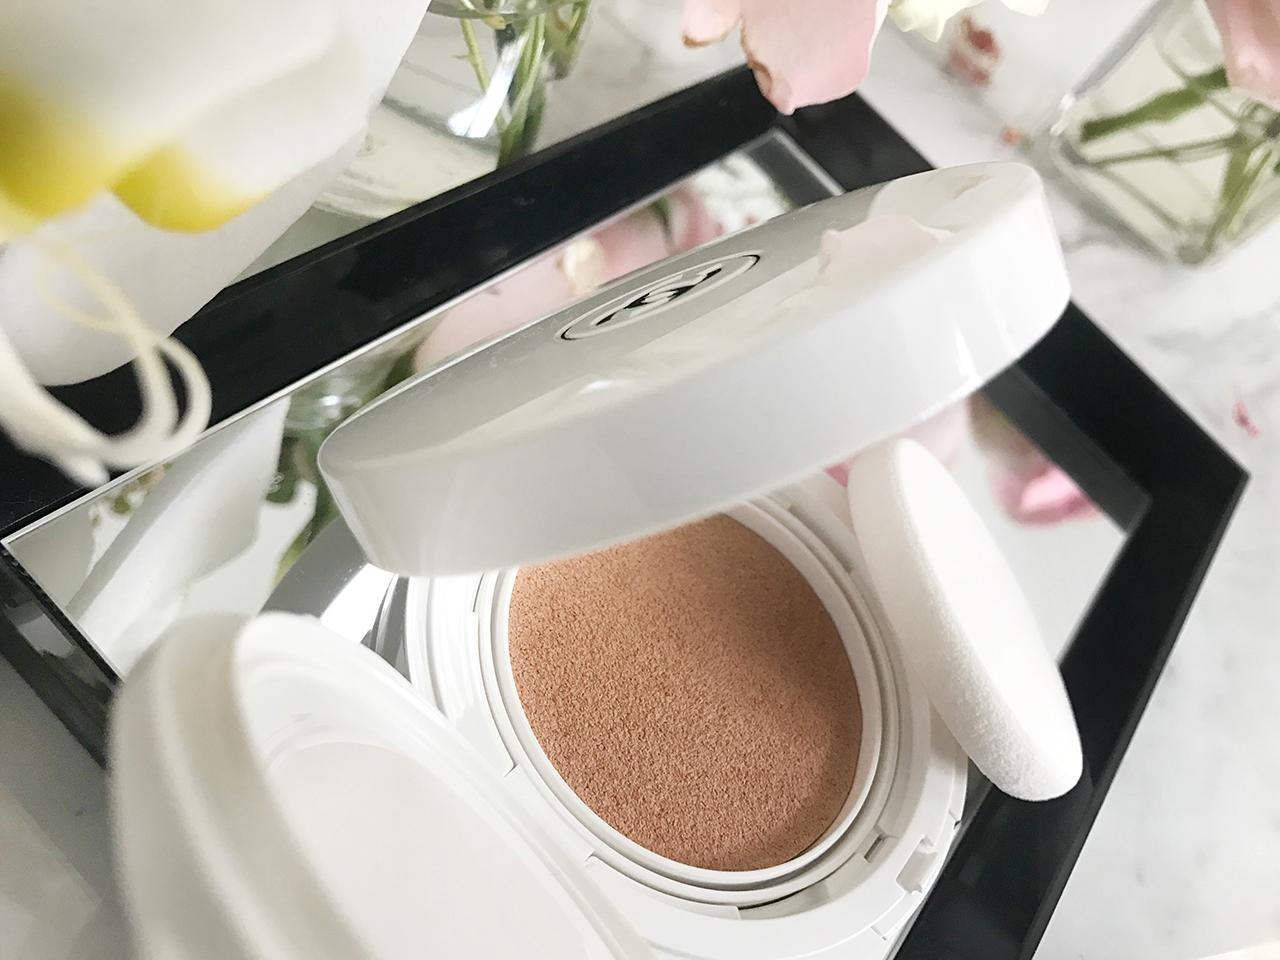 Chanel Le Blanc Oil in Cream Compact Foundation